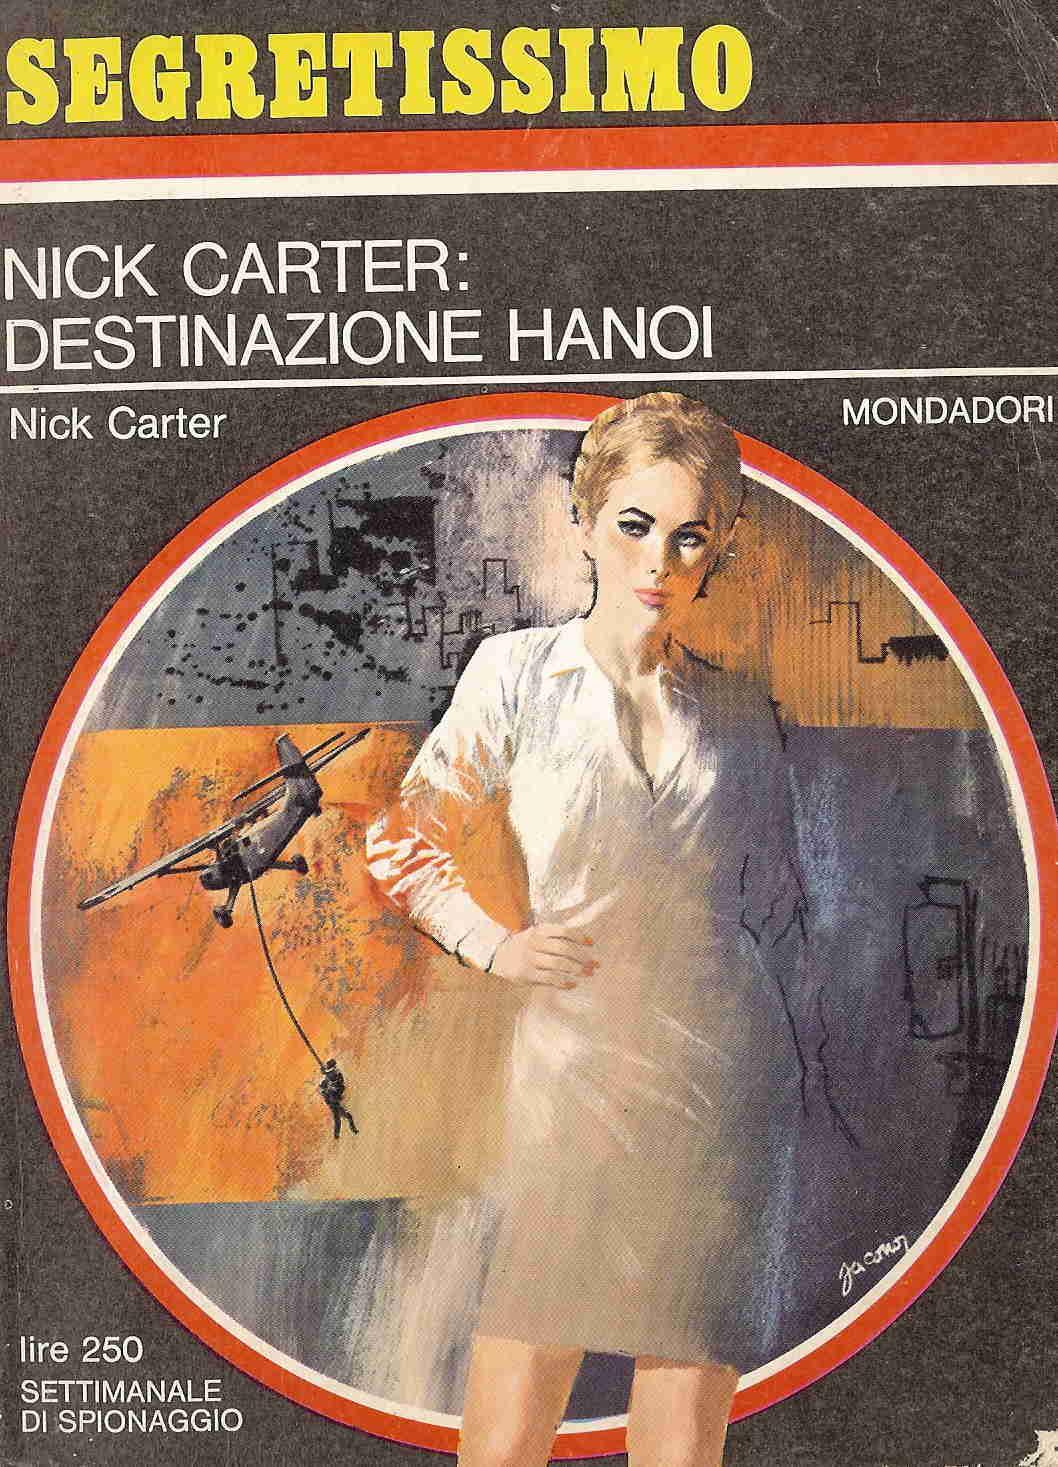 Nick Carter: Destinazione Hanoi